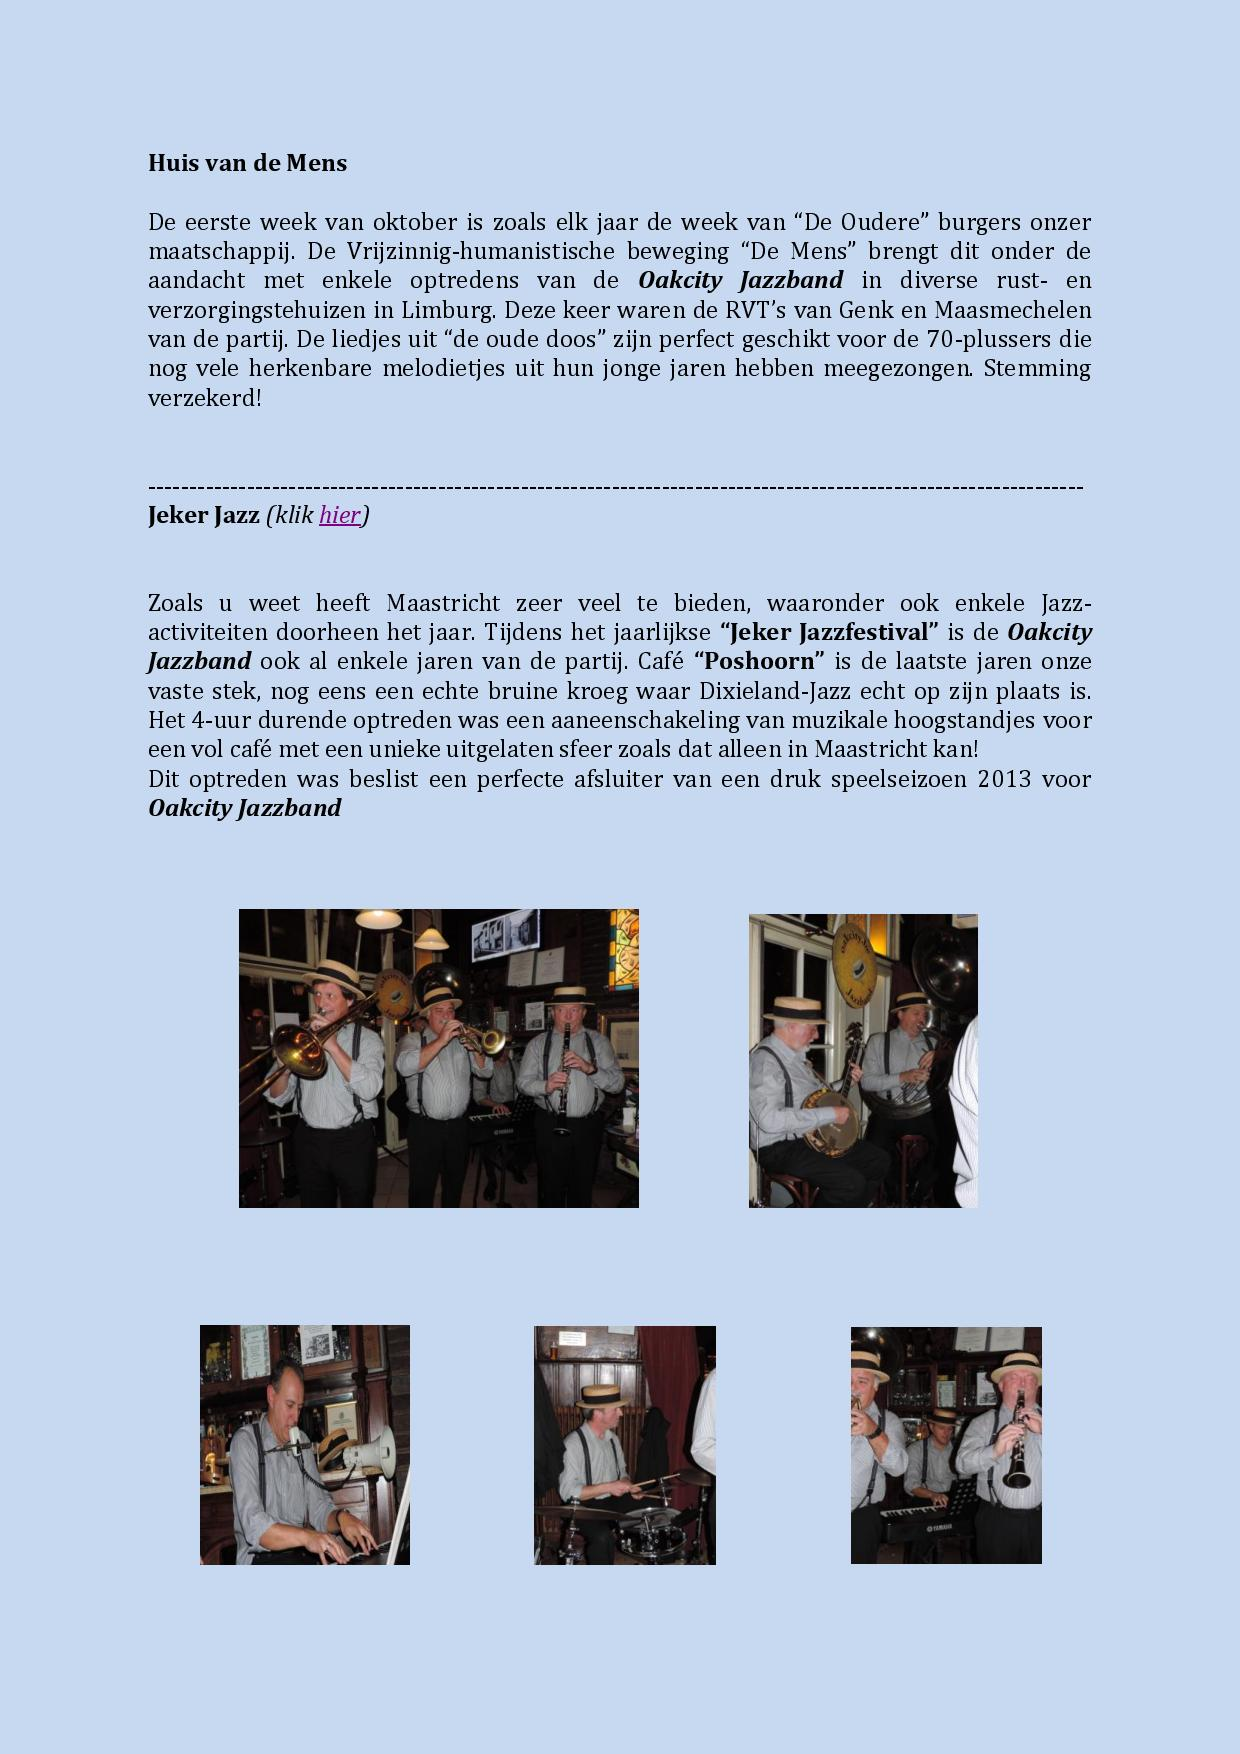 Nieuwsbrief Oakcity Jazzband najaar 2013-page-002